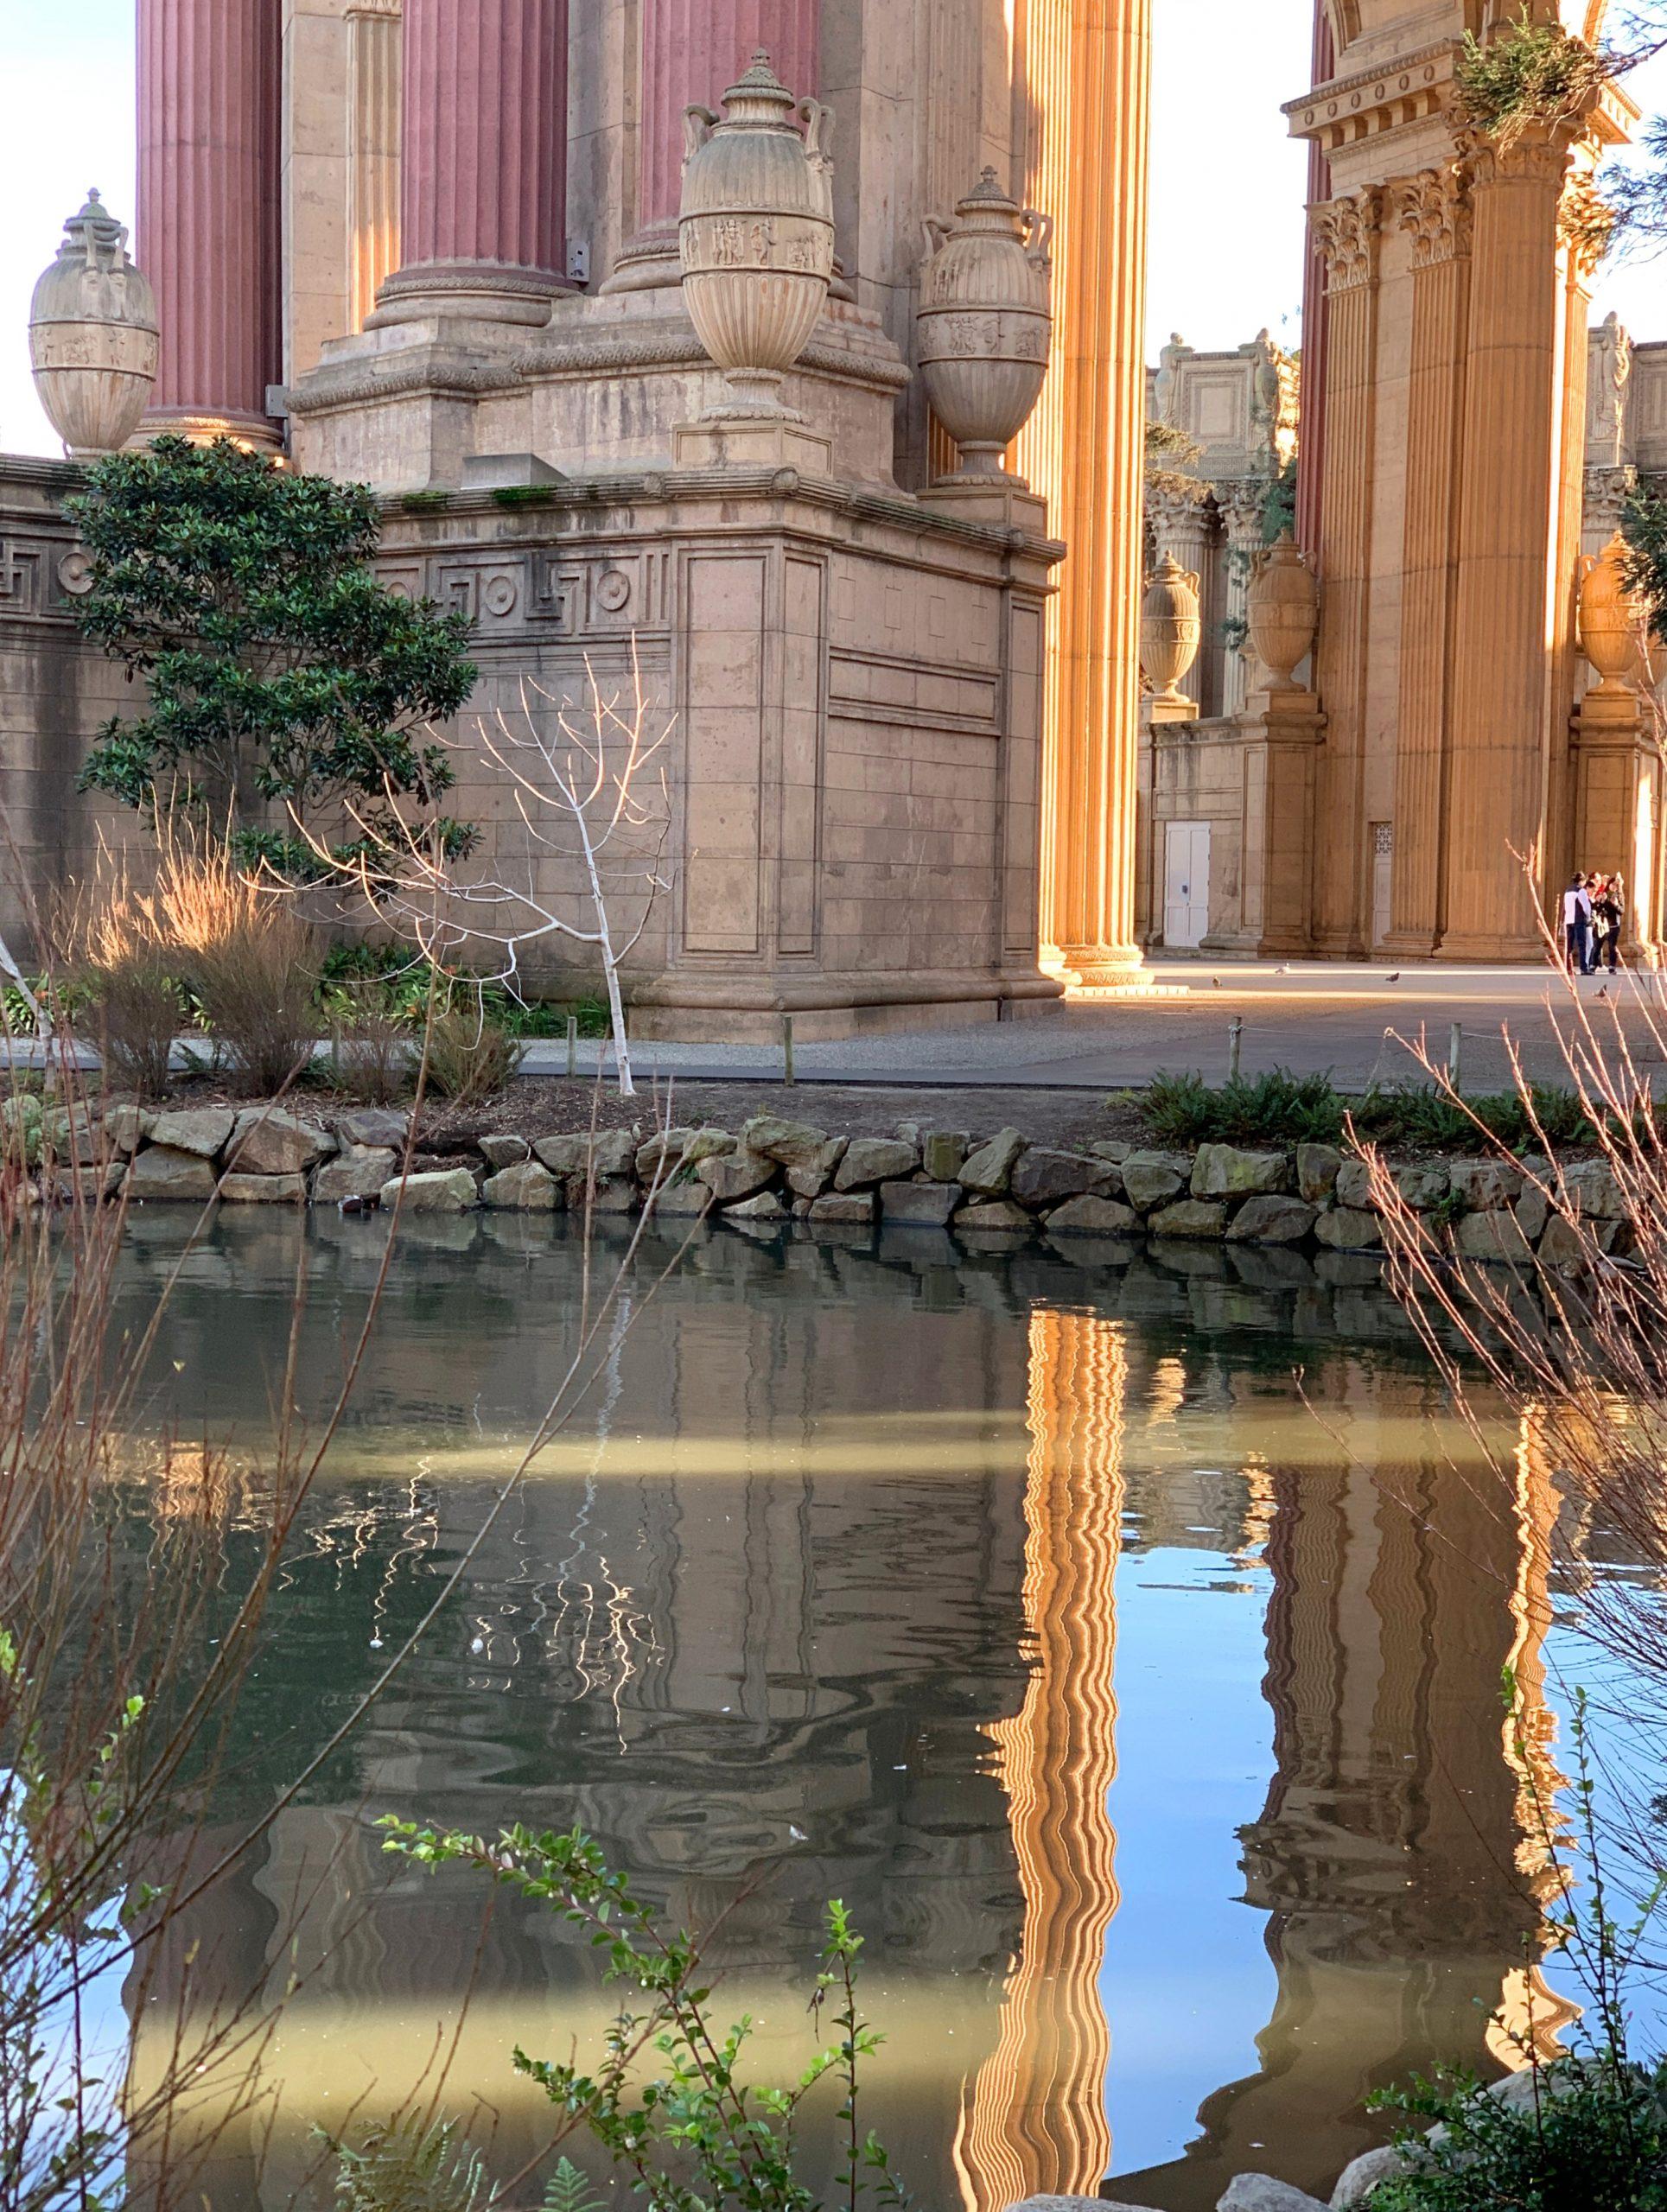 Visitar o Palace of Fine Arts - Hotel California Blog